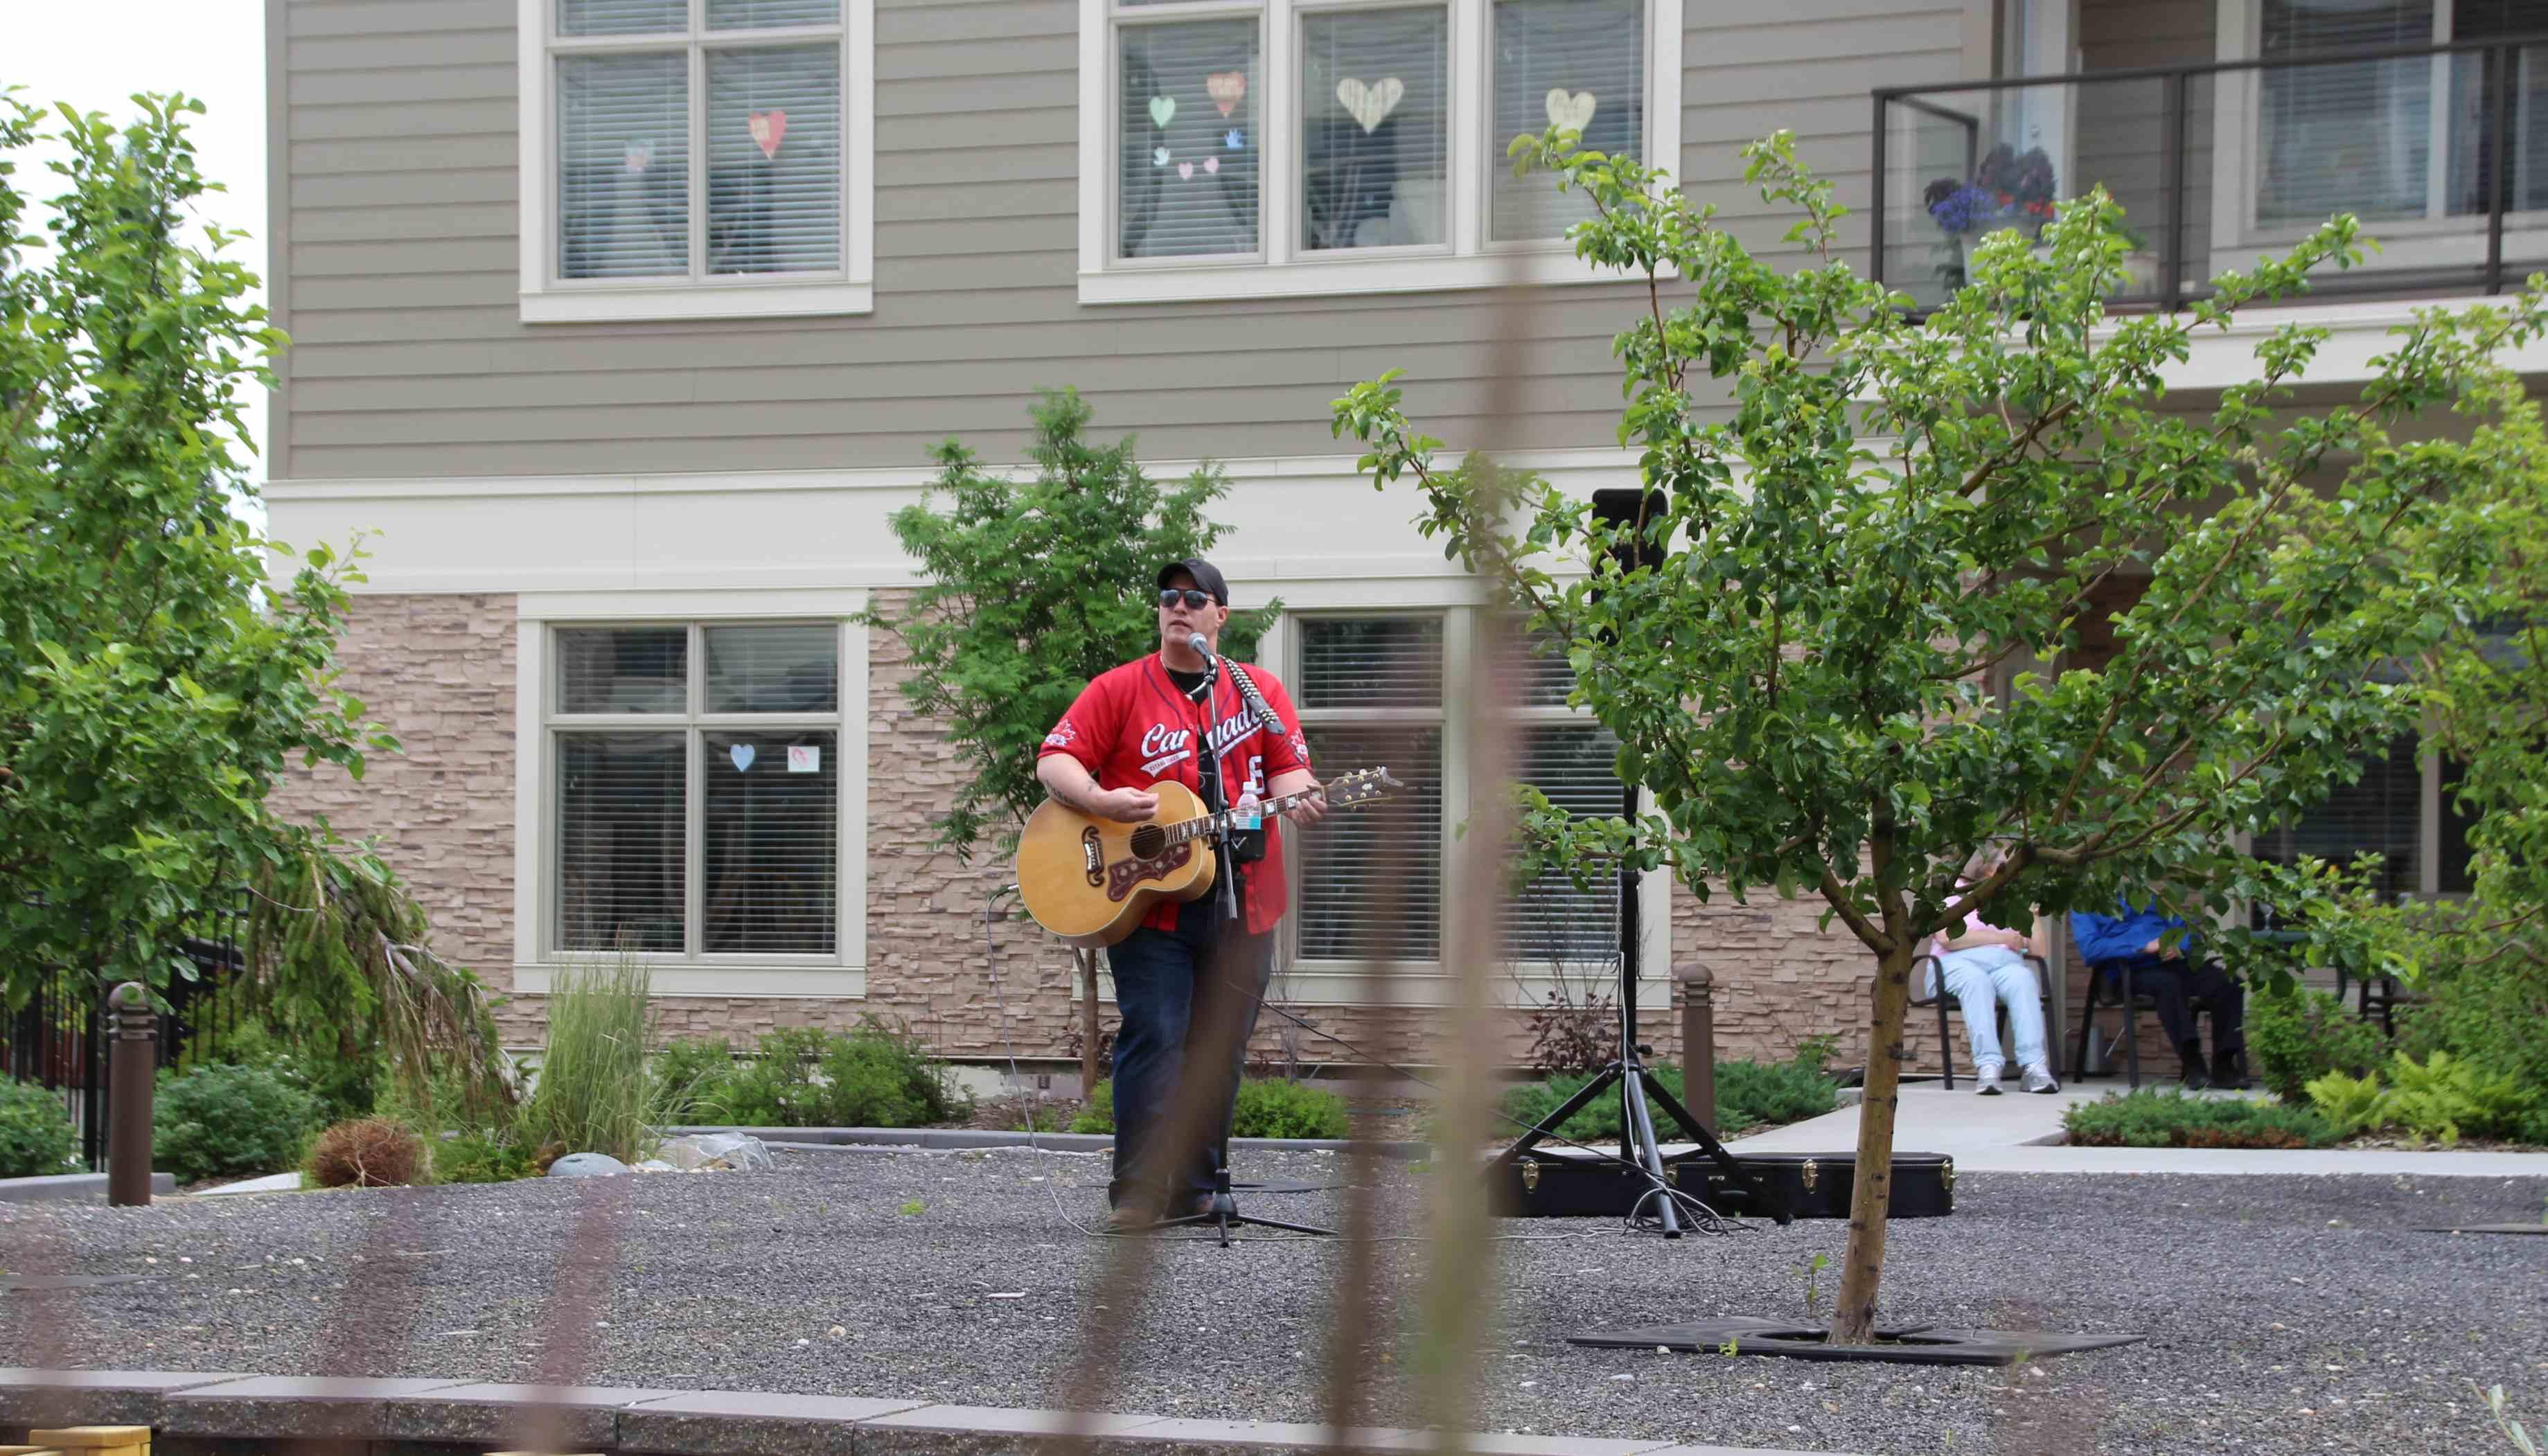 Singer Travis Pickering entertaining residents at United's Fish Creek community